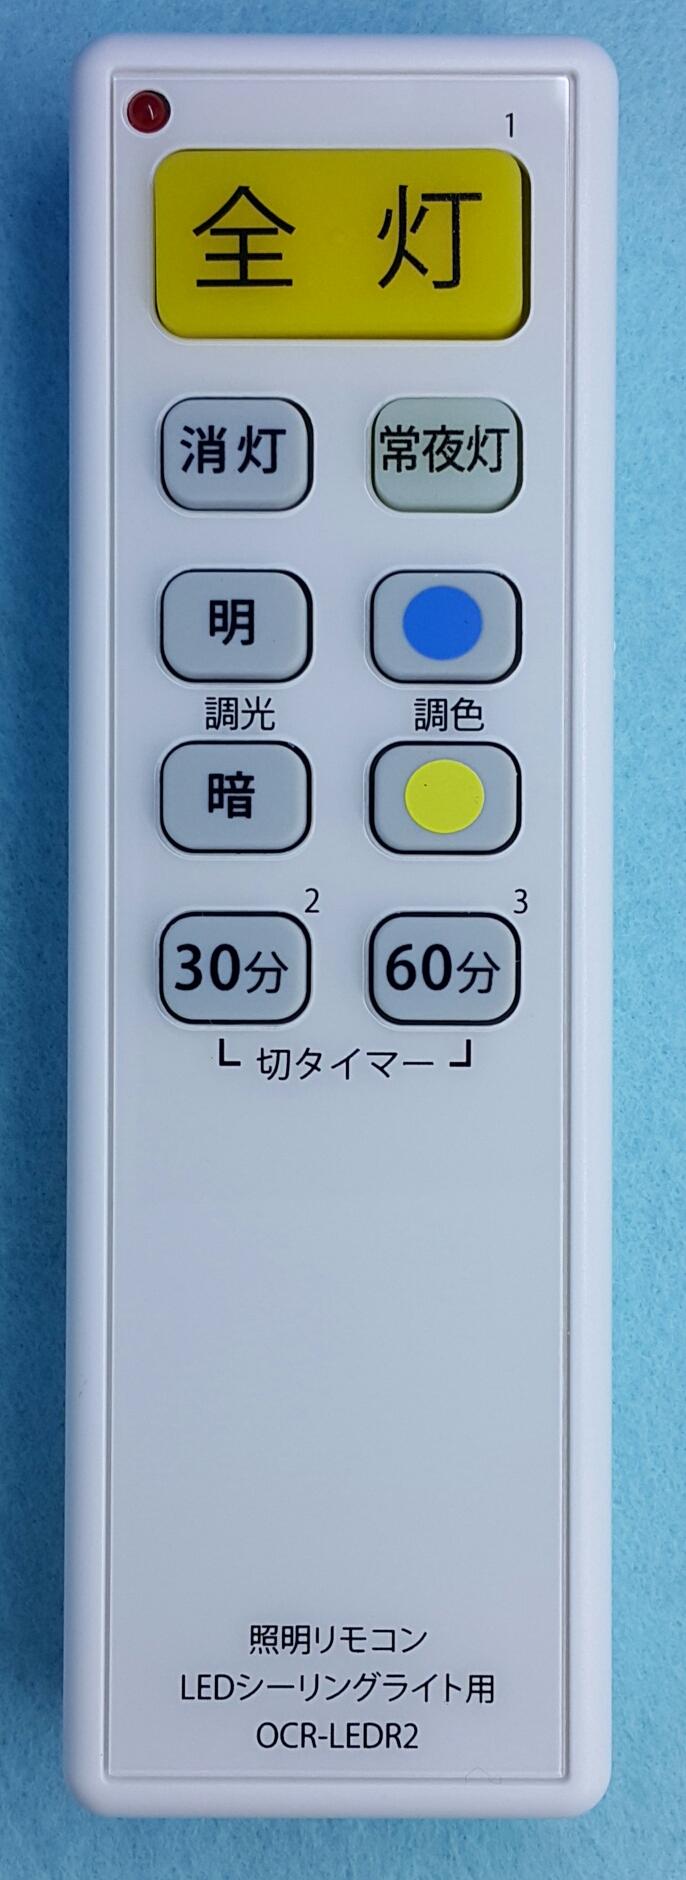 KOIZUMI_OCR-LEDR2_1211_L0176 807F_LAMP_cover.png